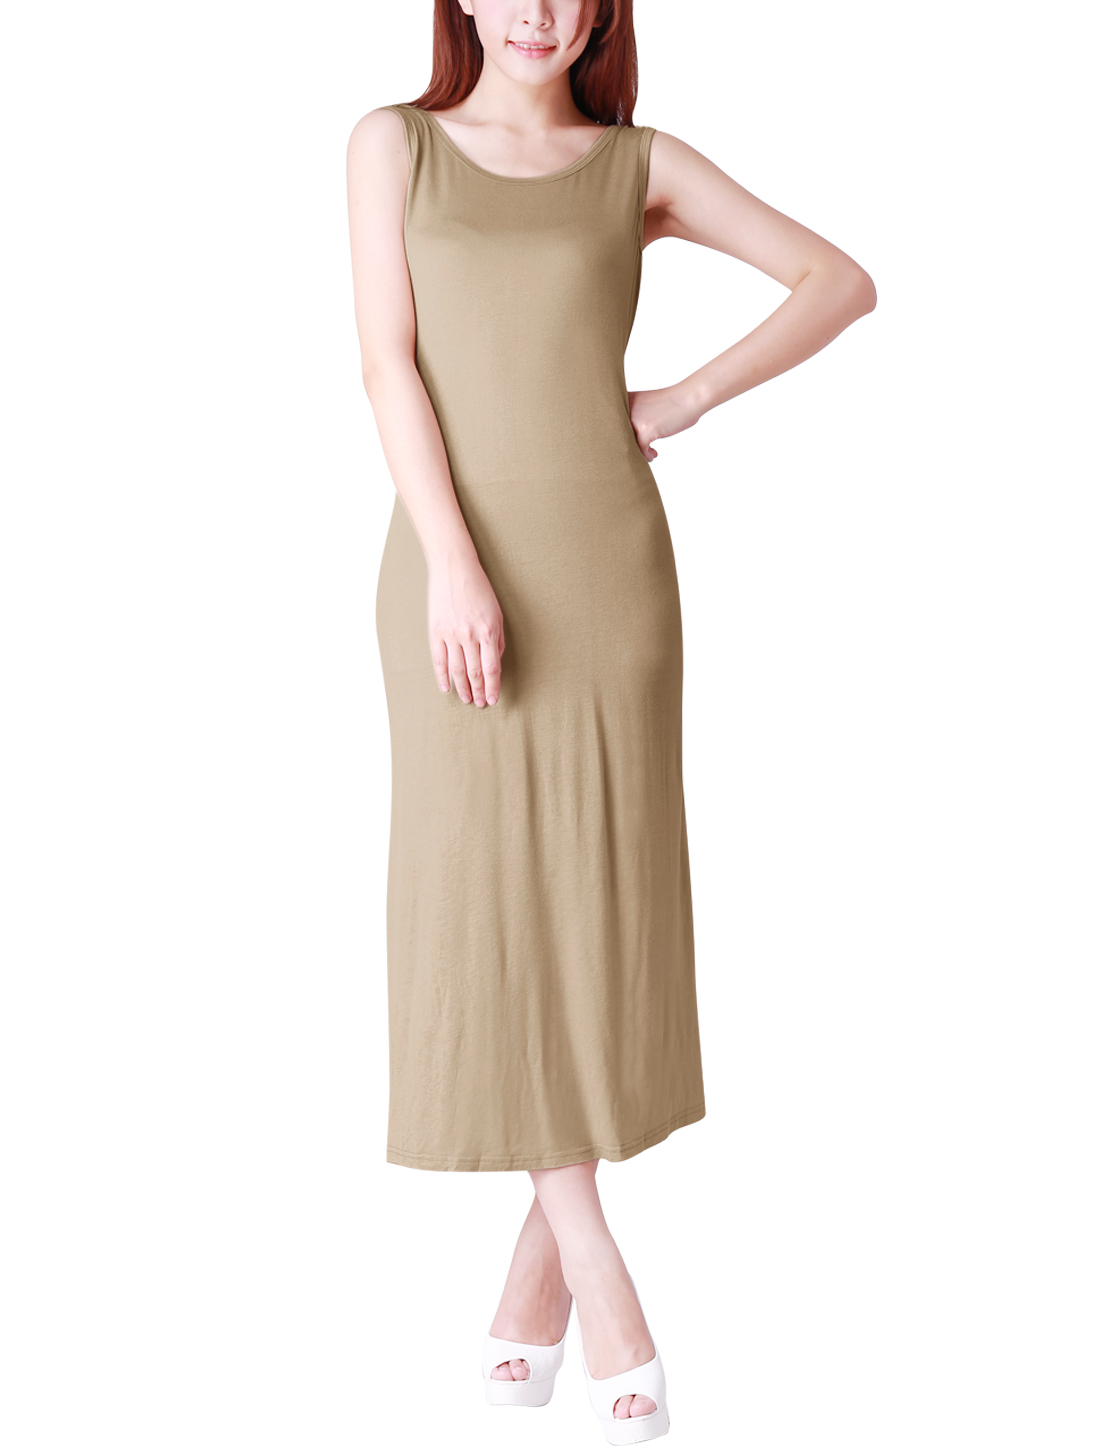 Ladies Stylish Bare Back Sleeveless Tank Dress Khaki L